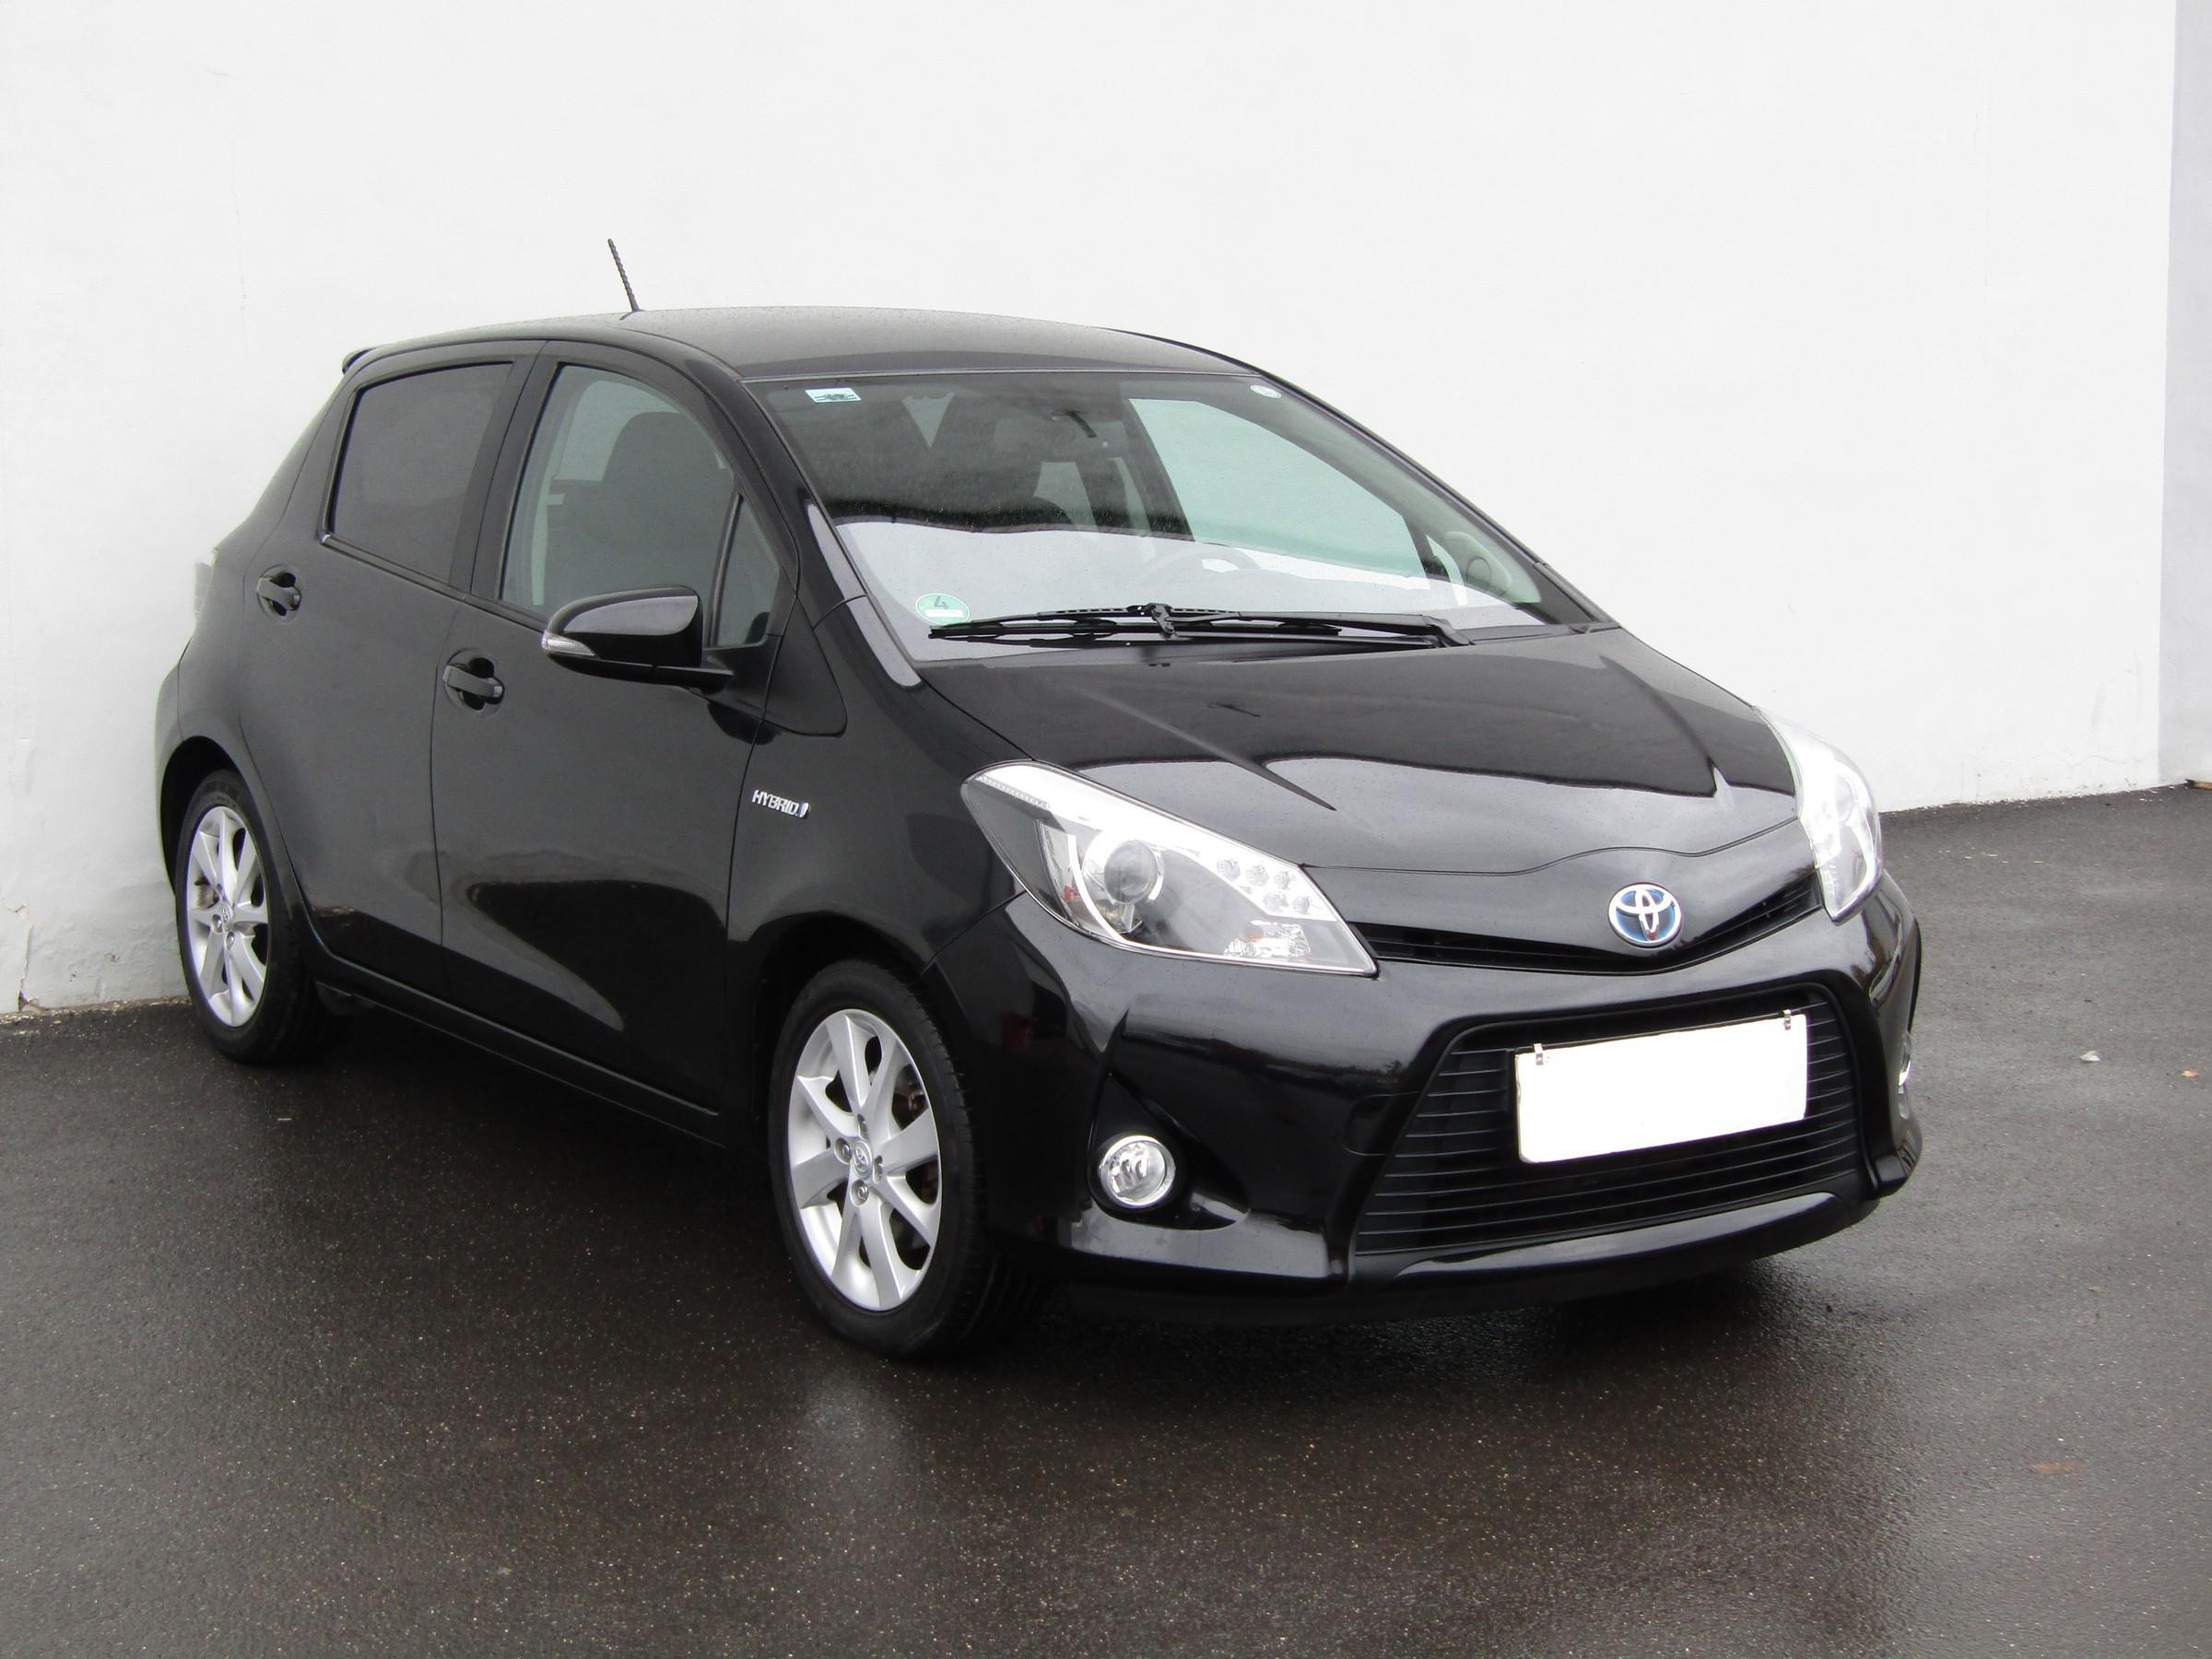 Toyota Yaris 1.5HSE